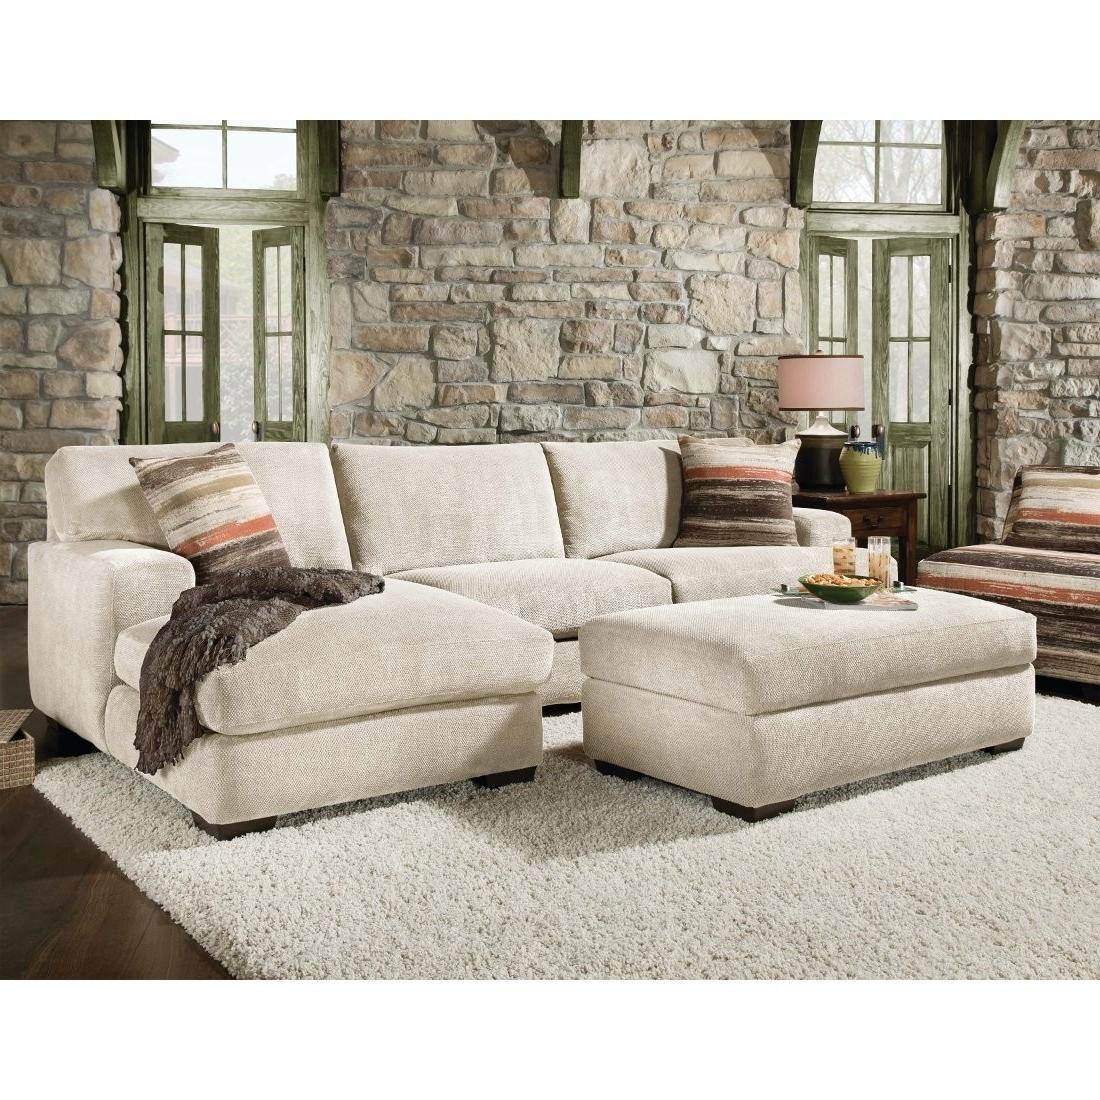 Corinthian Mead Sectional Sofa Piece (View 7 of 15)